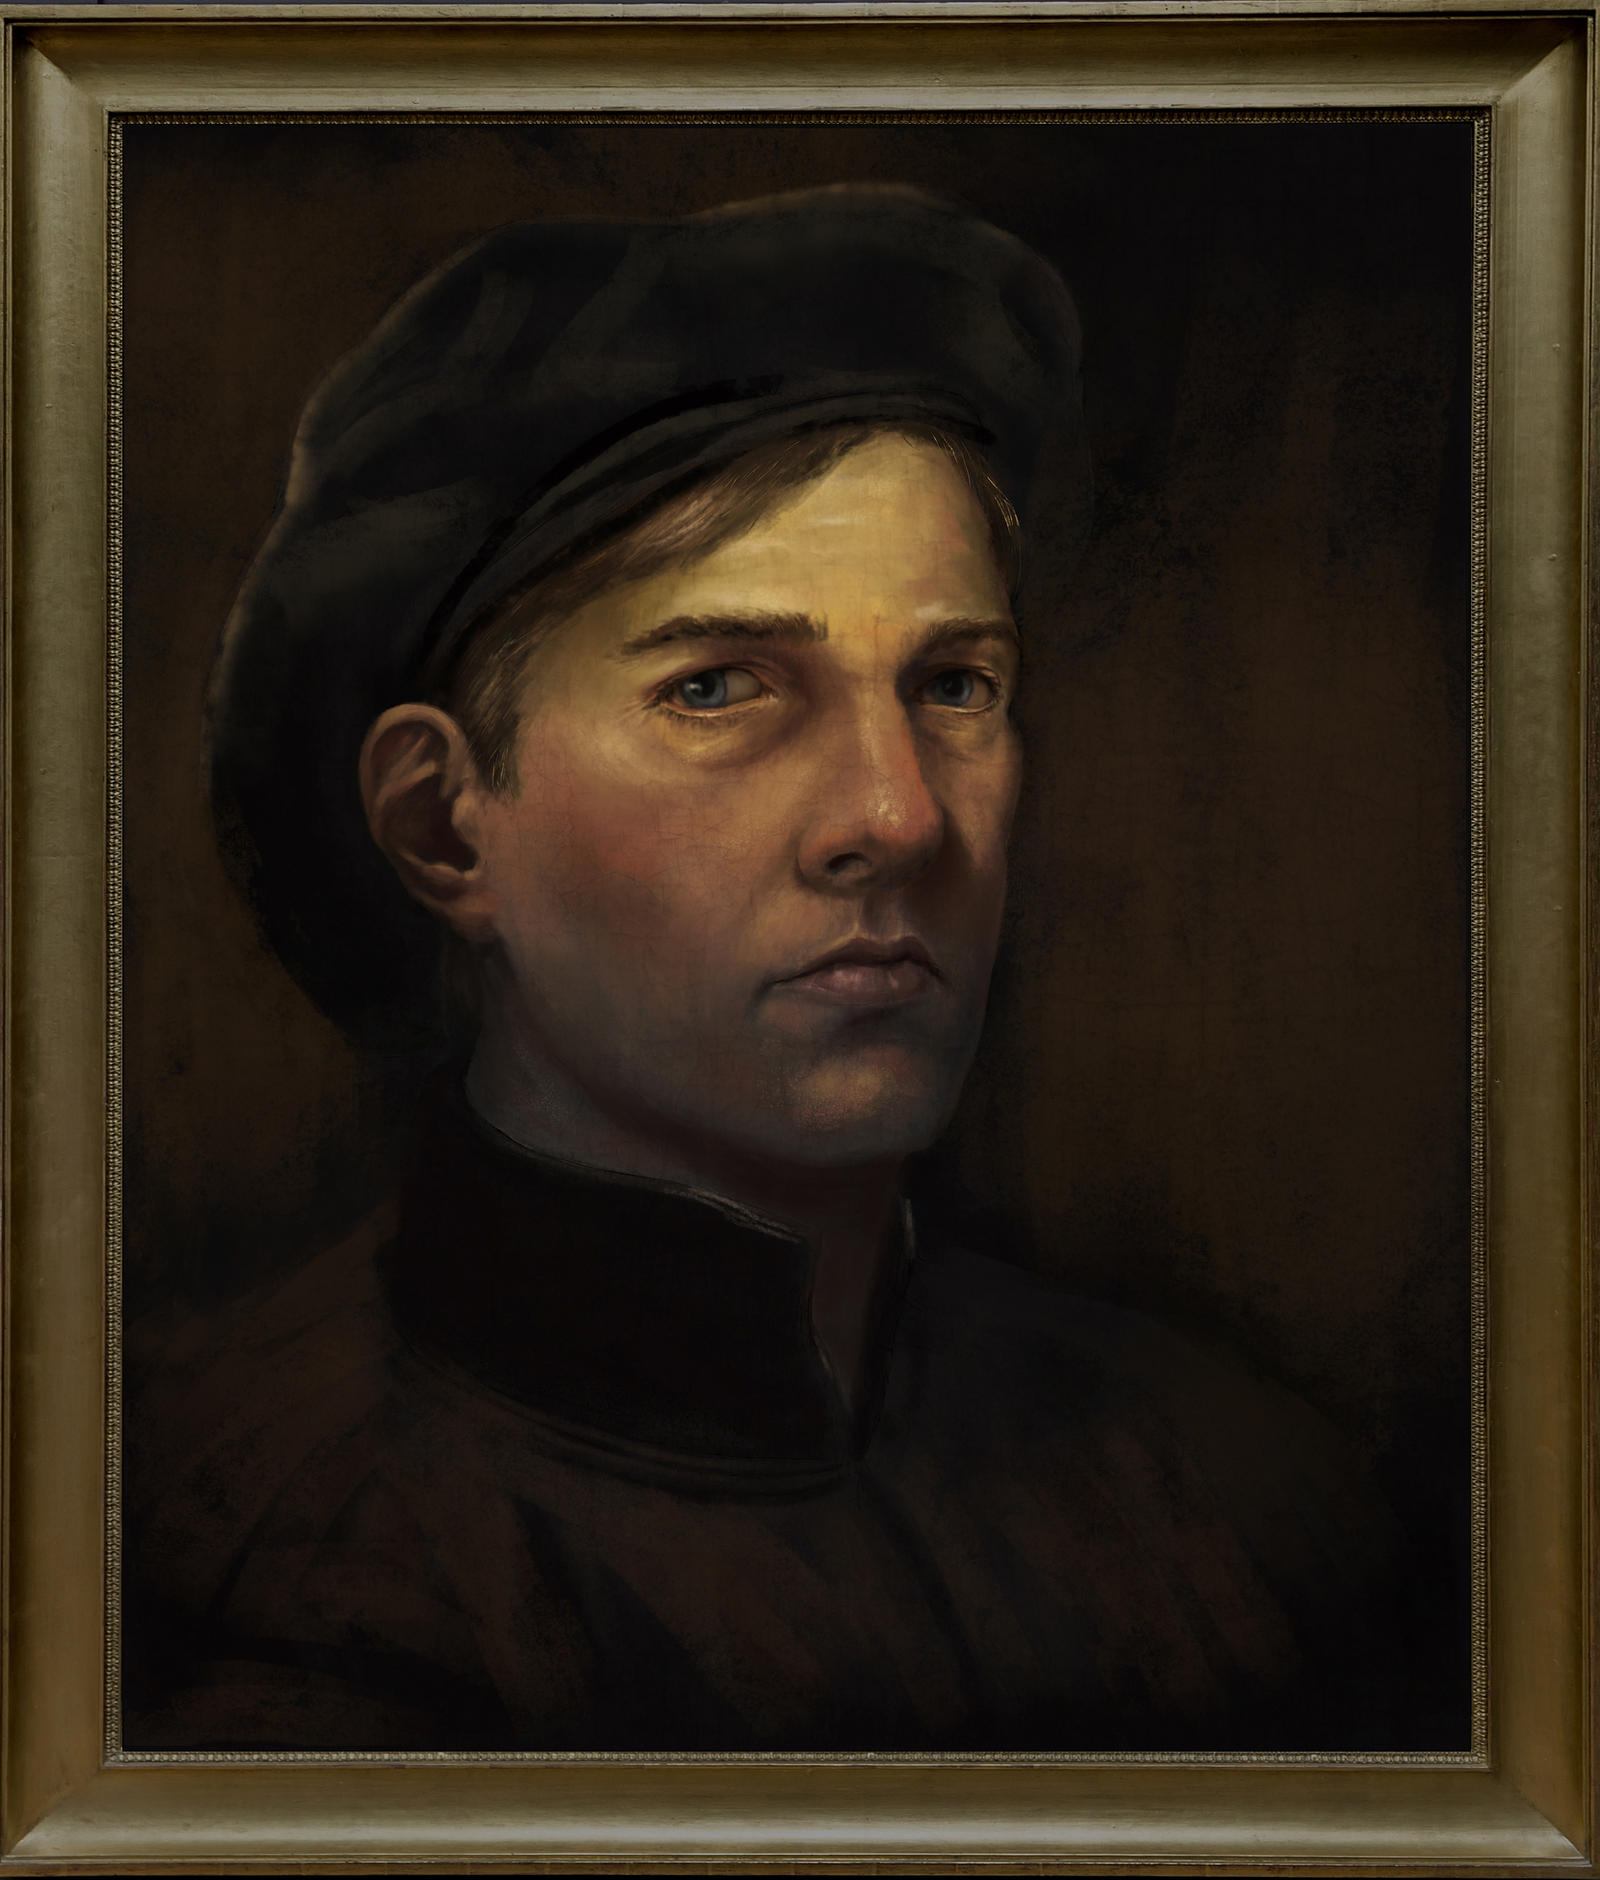 Elderscroller's Profile Picture